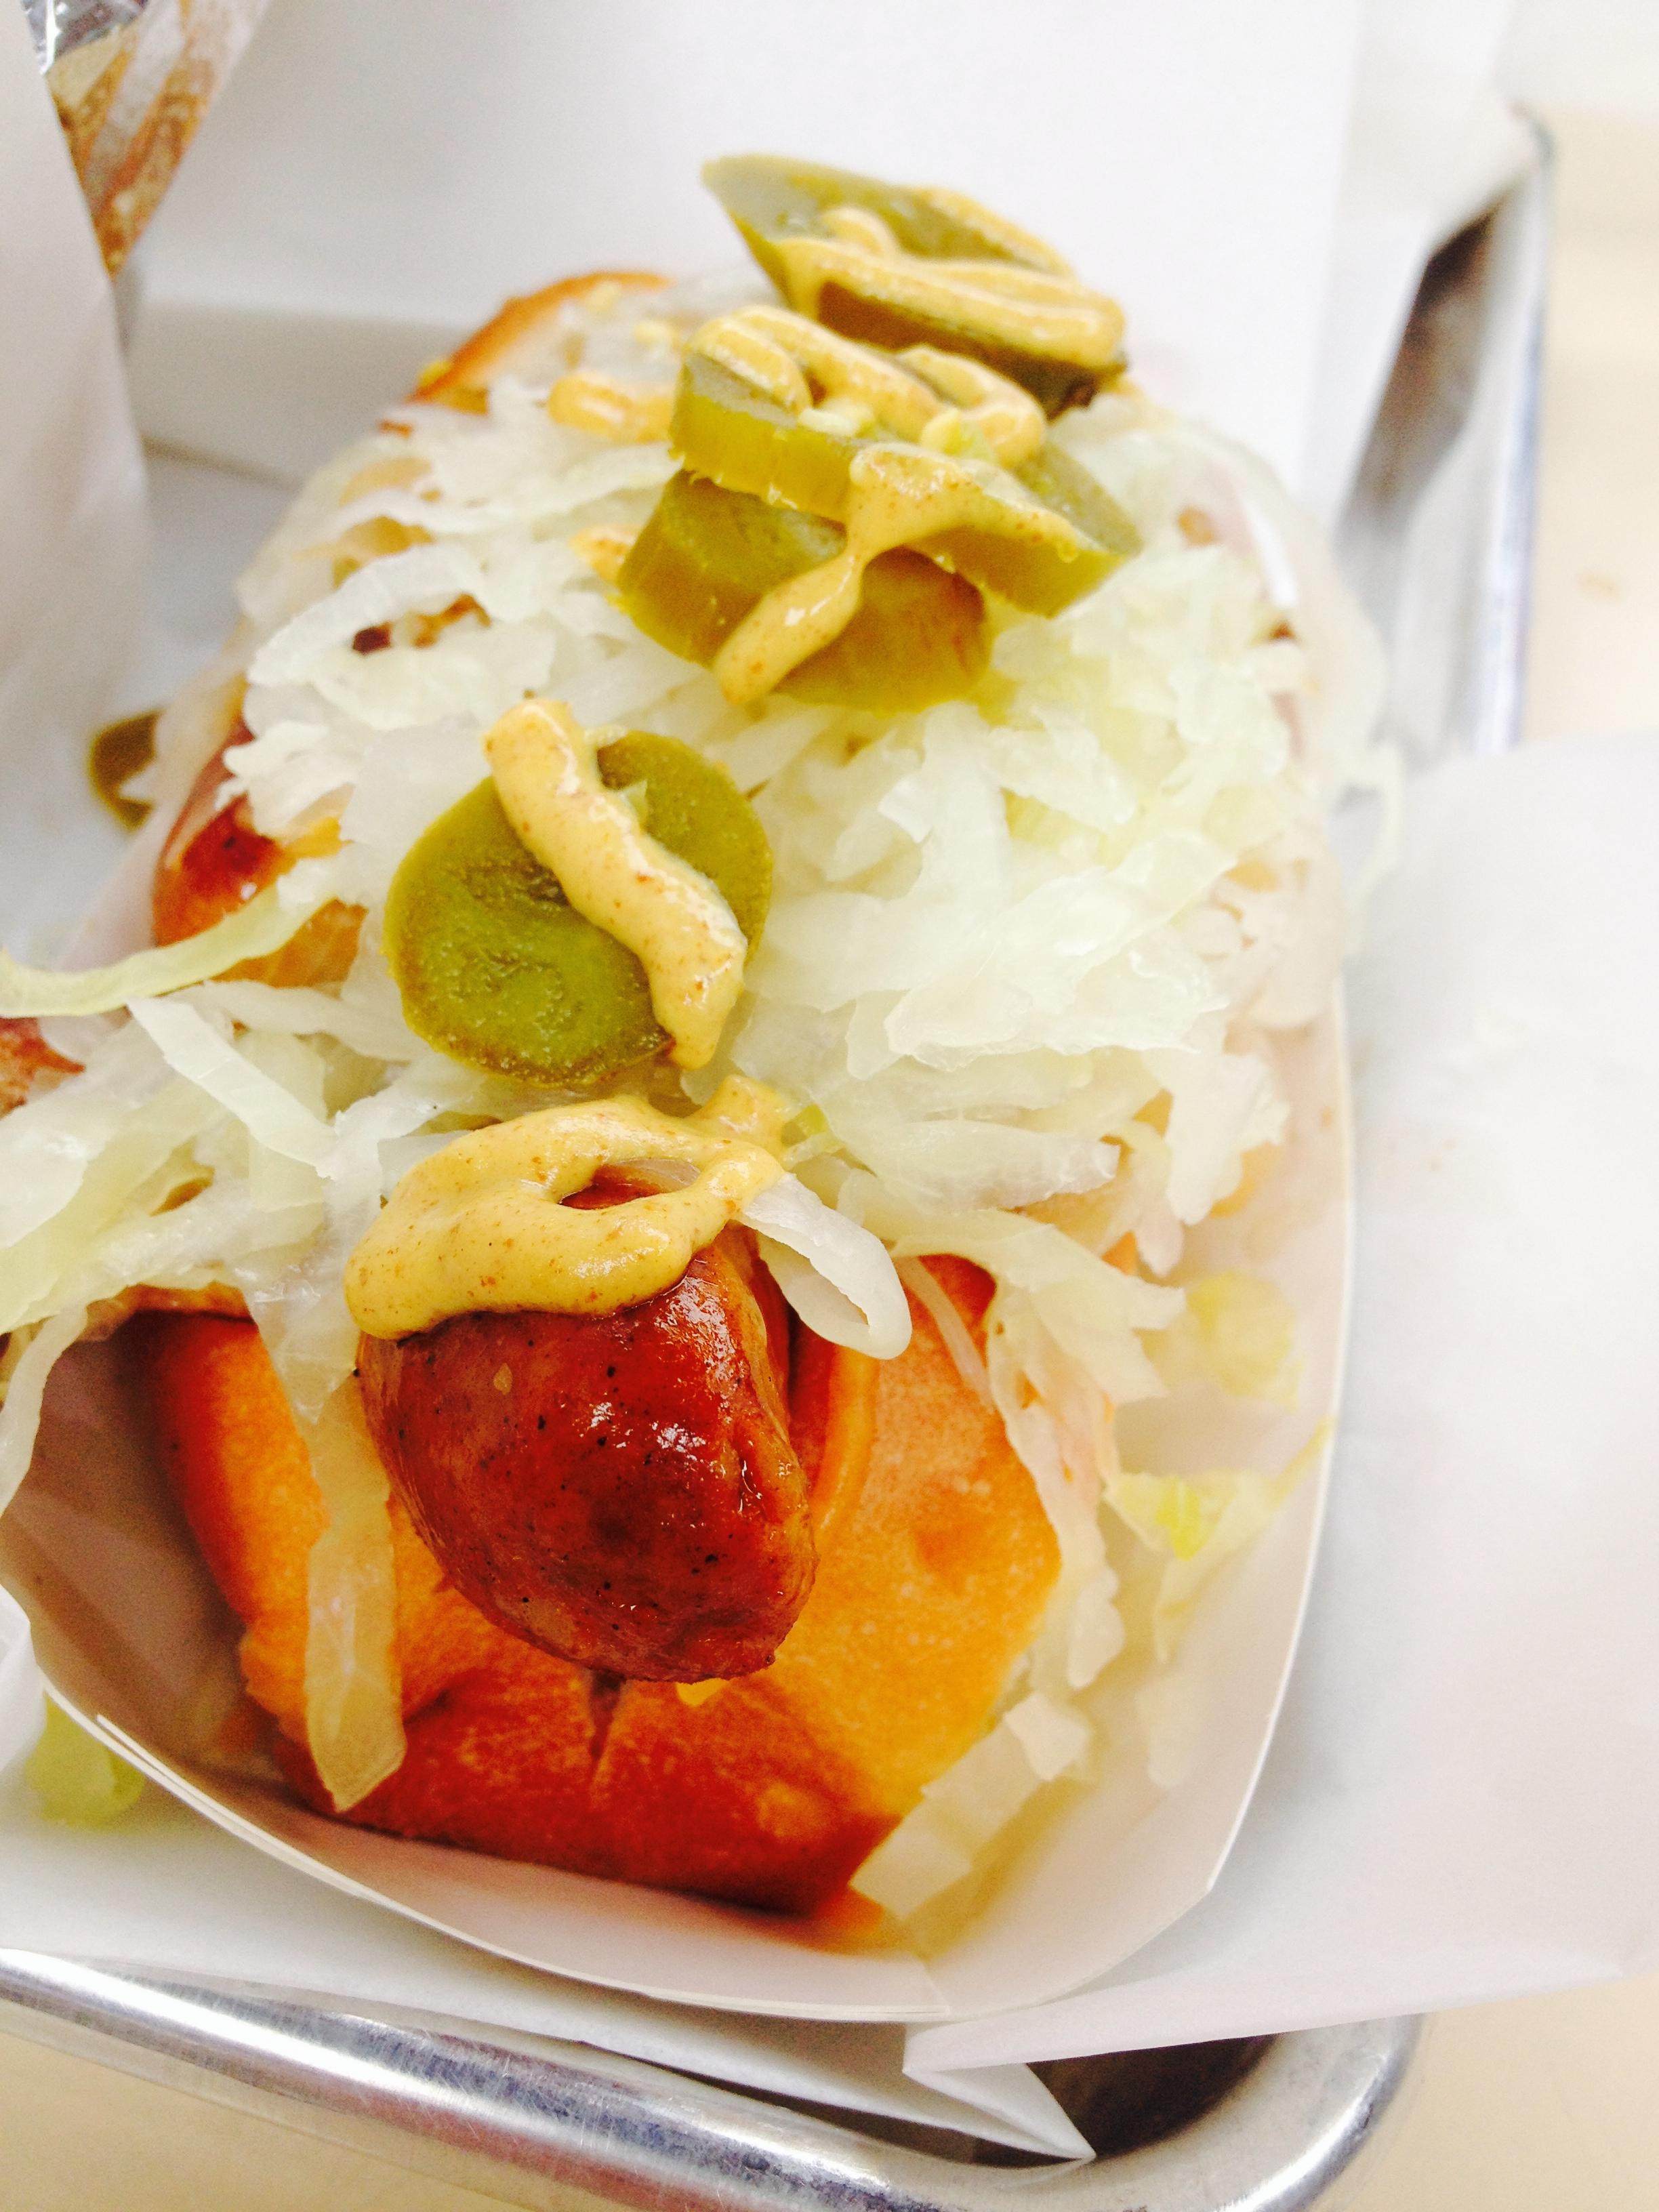 The all Beef Sauerkraut Dog on an original bun with sauerkraut with Dijon mustard (and added  jalapeño s!)